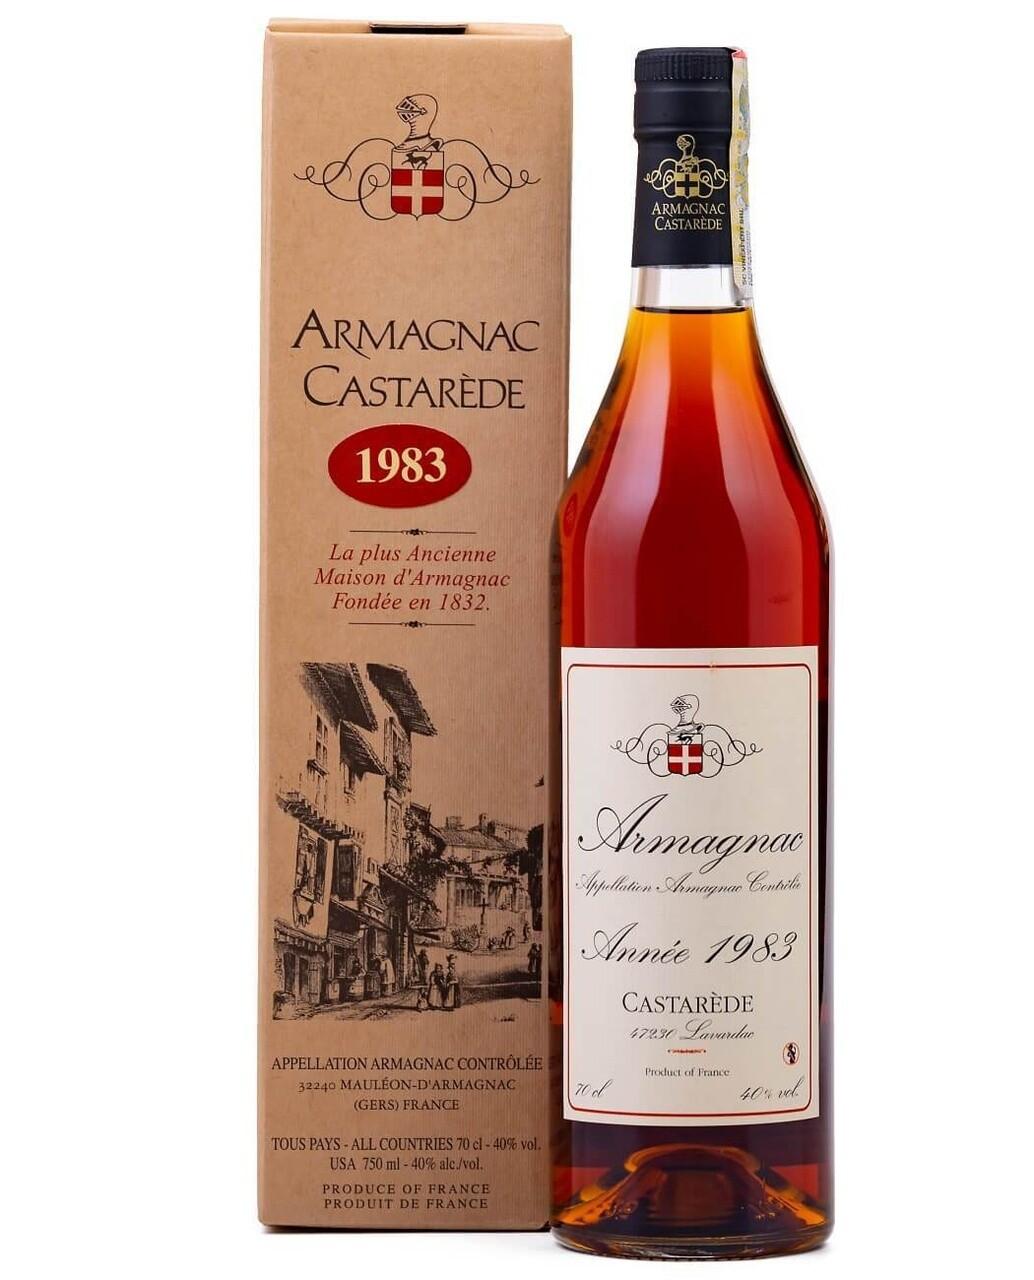 Armagnac Castarede 1983 0.5L